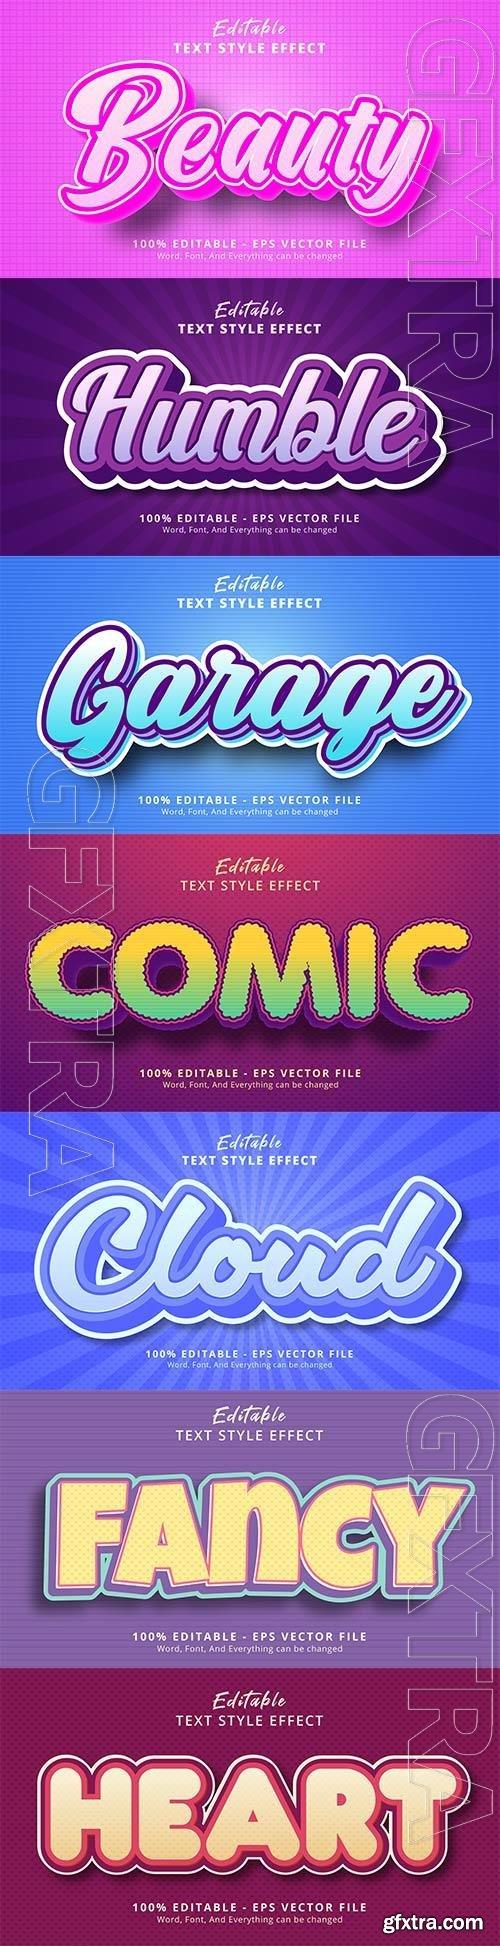 Set 3d editable text style effect vector vol 162